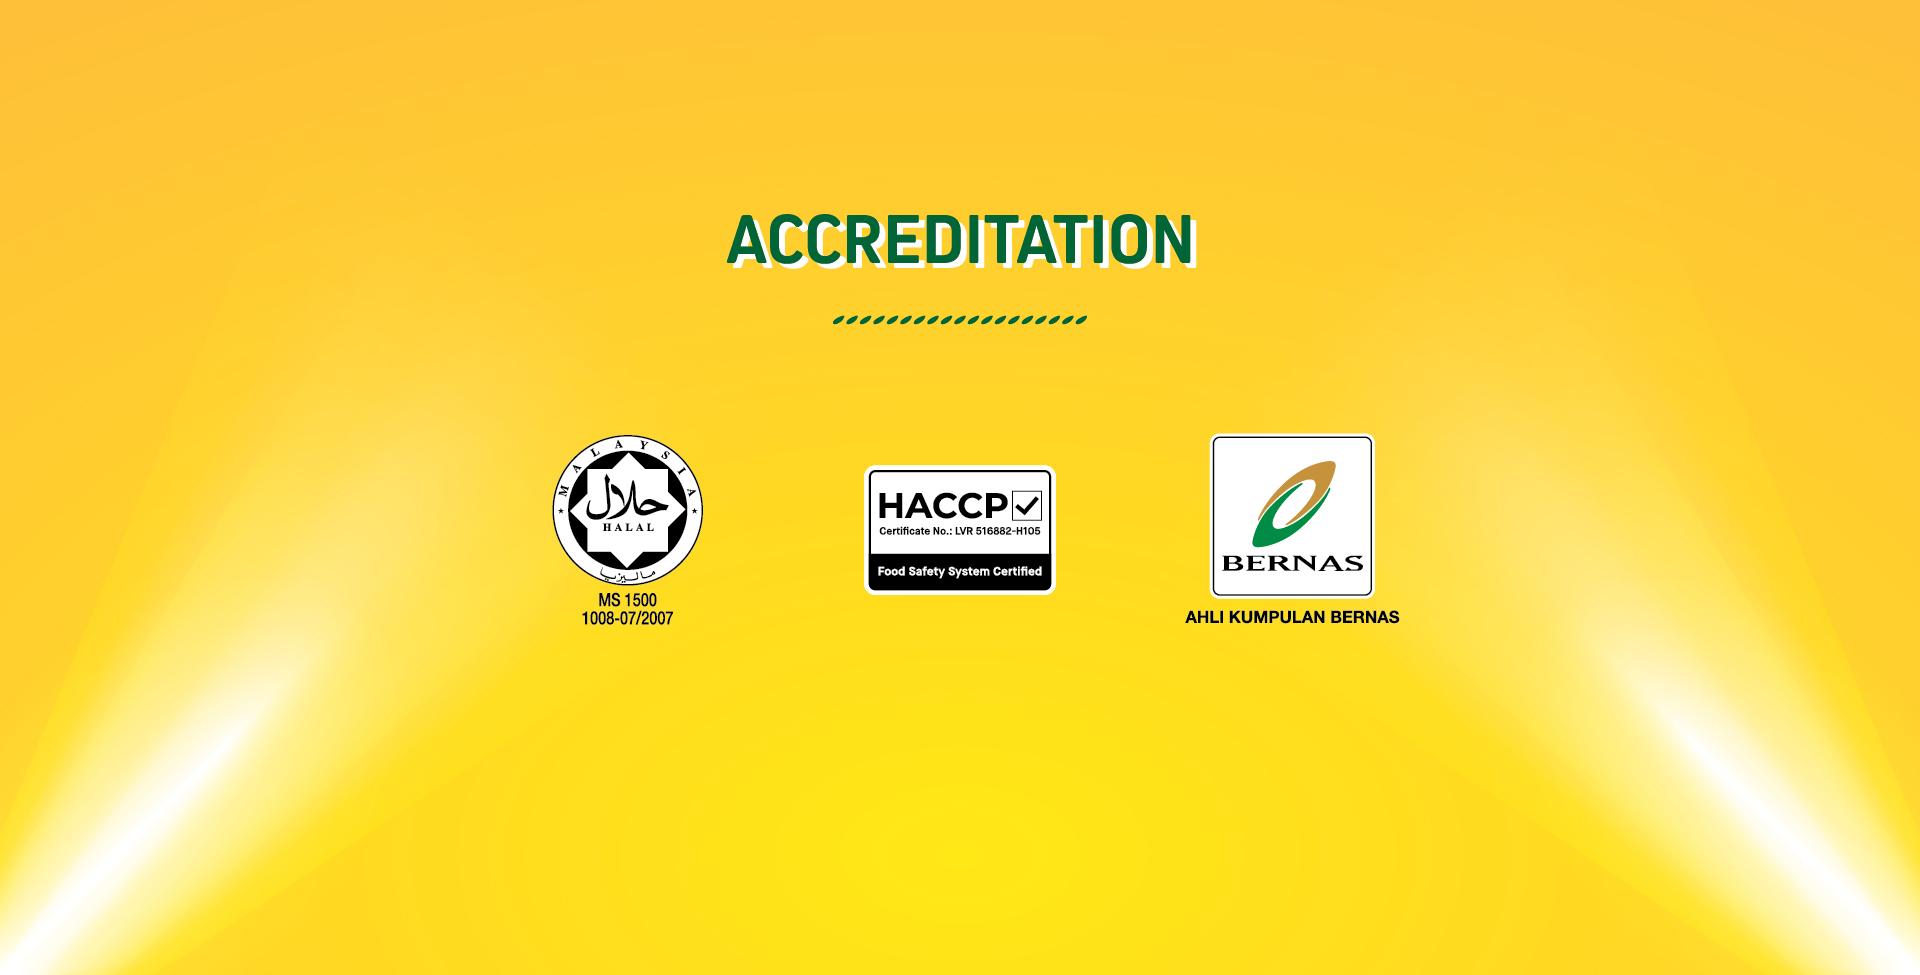 accreditationbanner.jpg